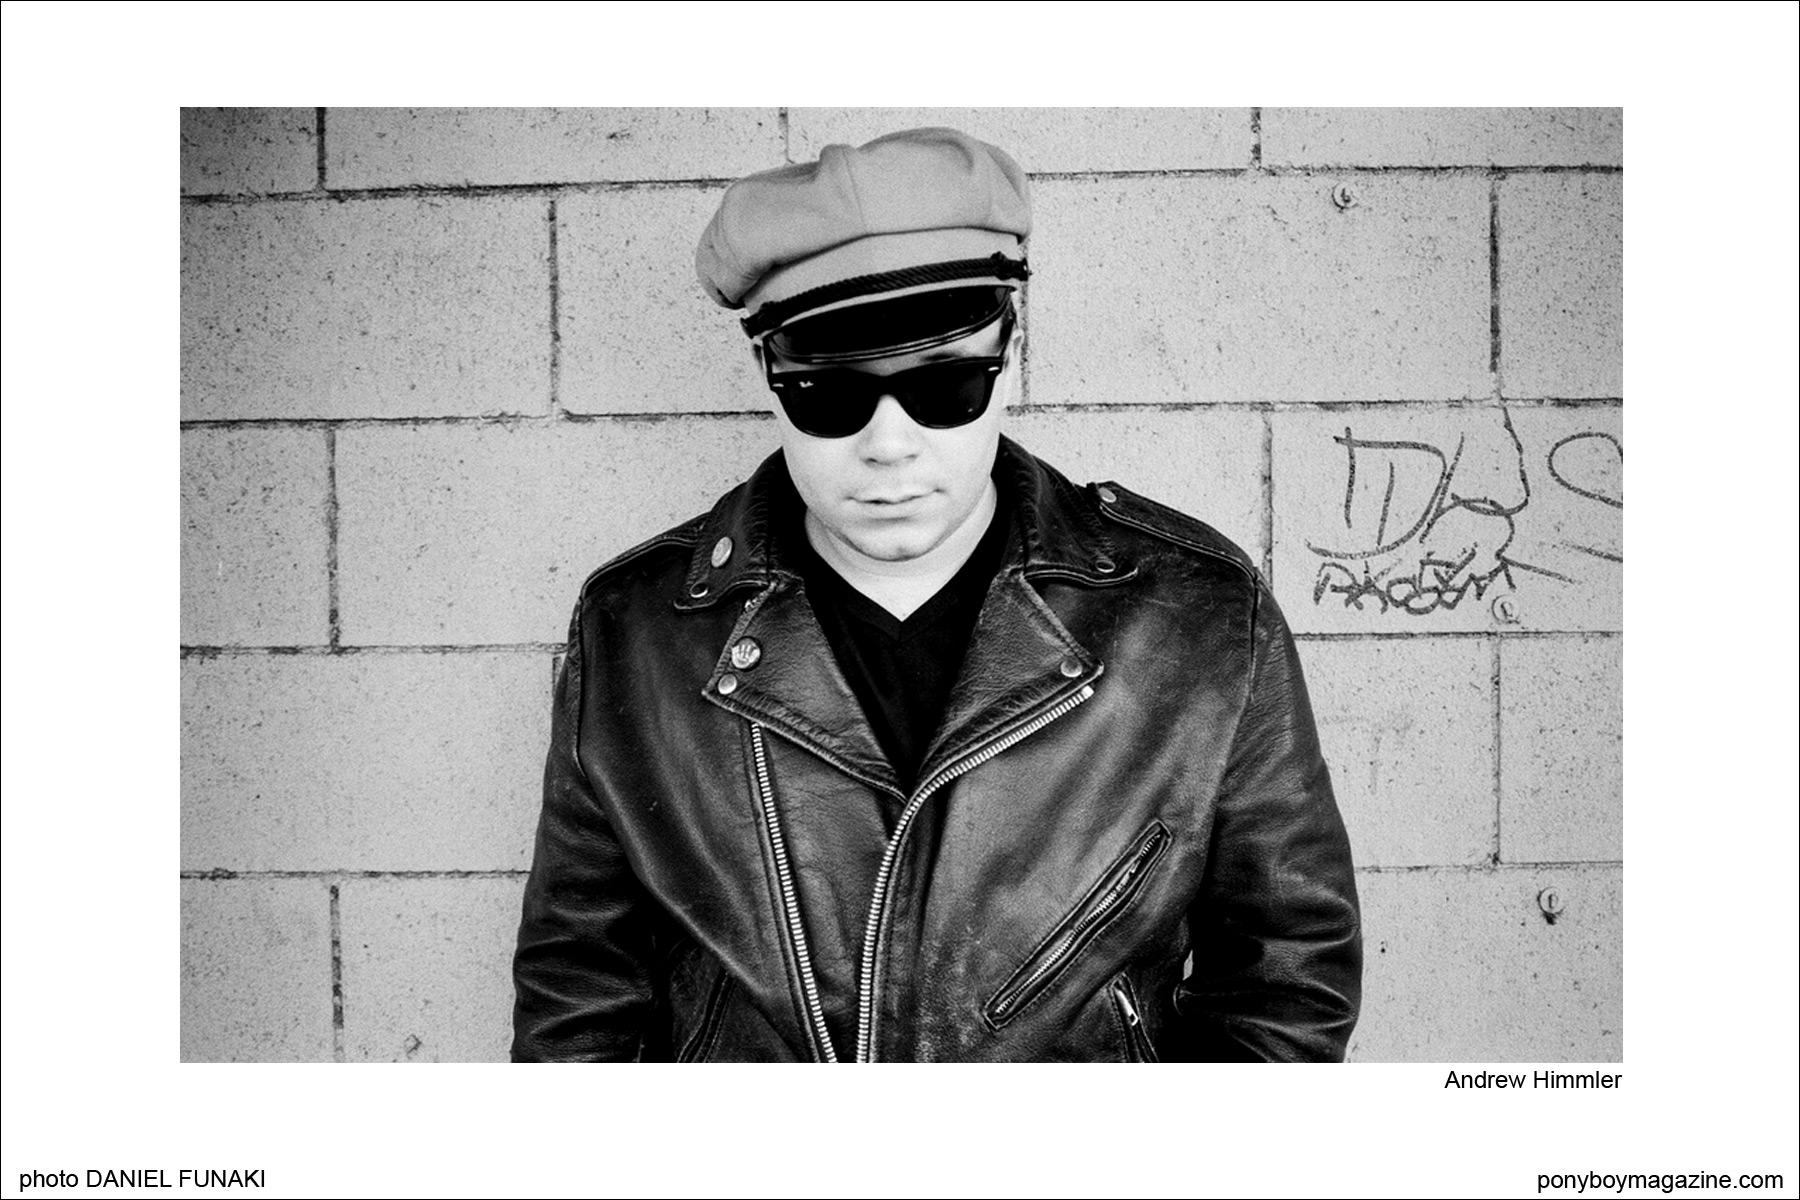 Rockabilly musician Andrew Himmler, photographed by Daniel Funaki. Ponyboy Magazine.